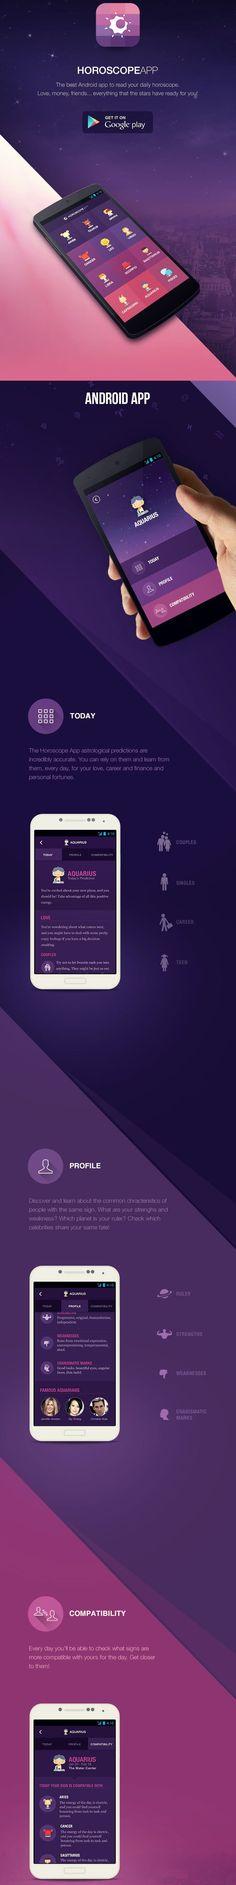 The Horoscope App android smartphone flat design / Reznik Umar Web And App Design, Ios App Design, User Interface Design, Flat Design, Android Design, Mobile Application Design, Mobile Ui Design, Android Ui, Android Smartphone